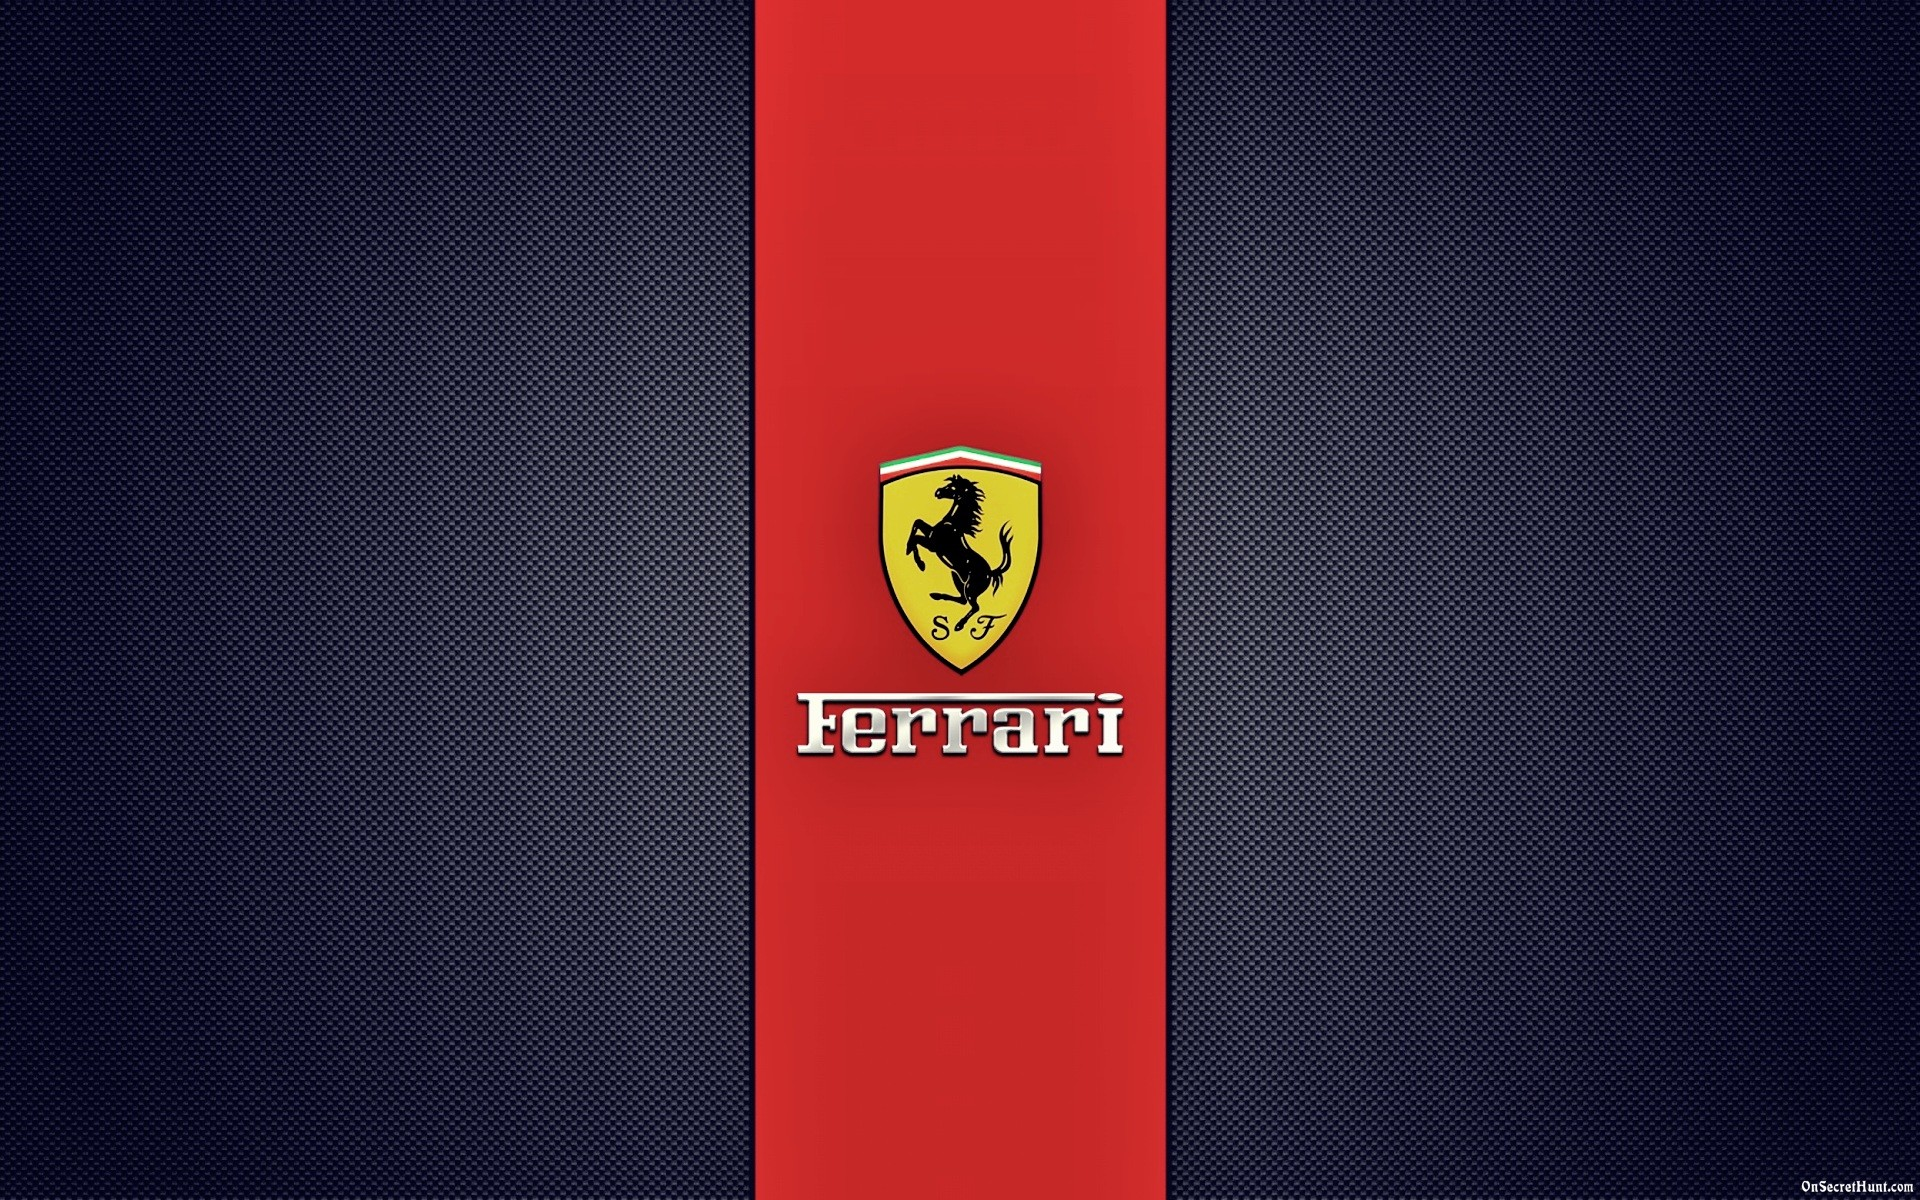 Ferrari logo Wallpapers Pictures | Wallpapers 4k | Pinterest | Ferrari logo  and Wallpaper